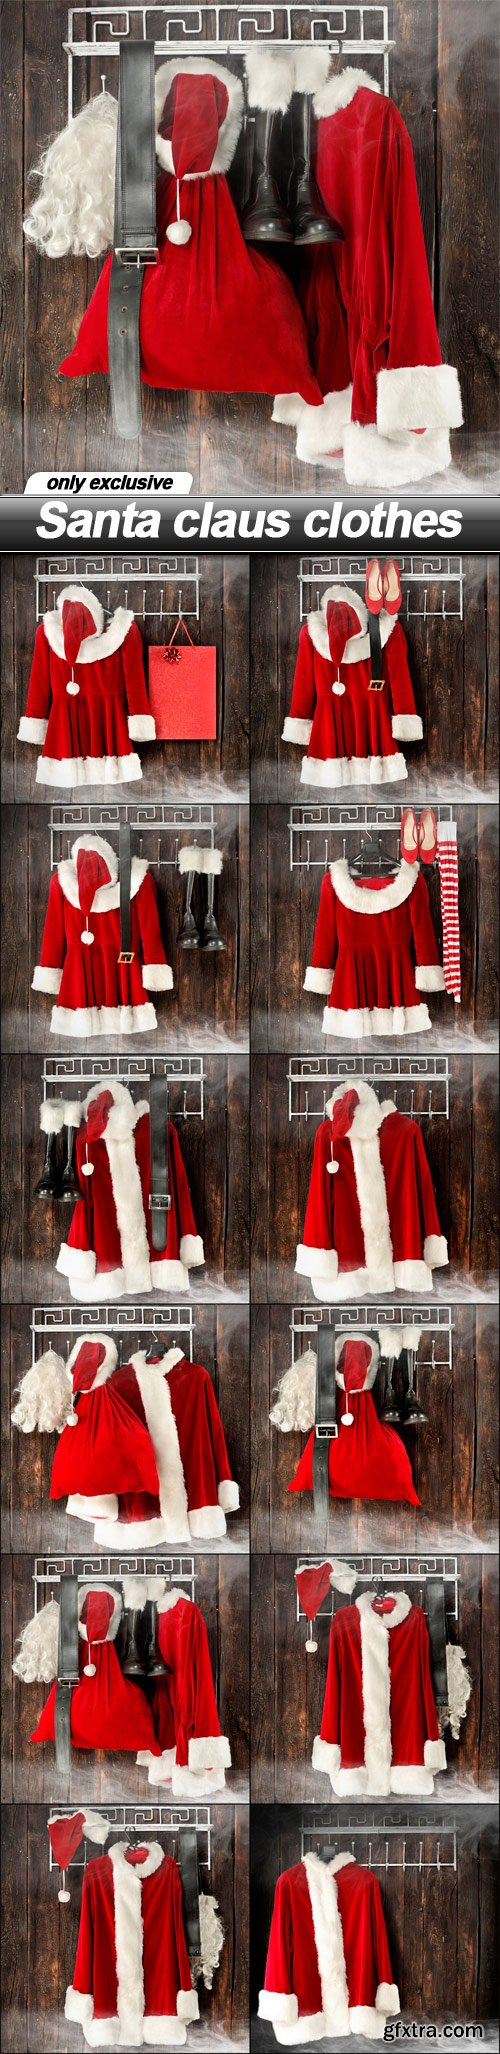 Santa claus clothes - 13 UHQ JPEG